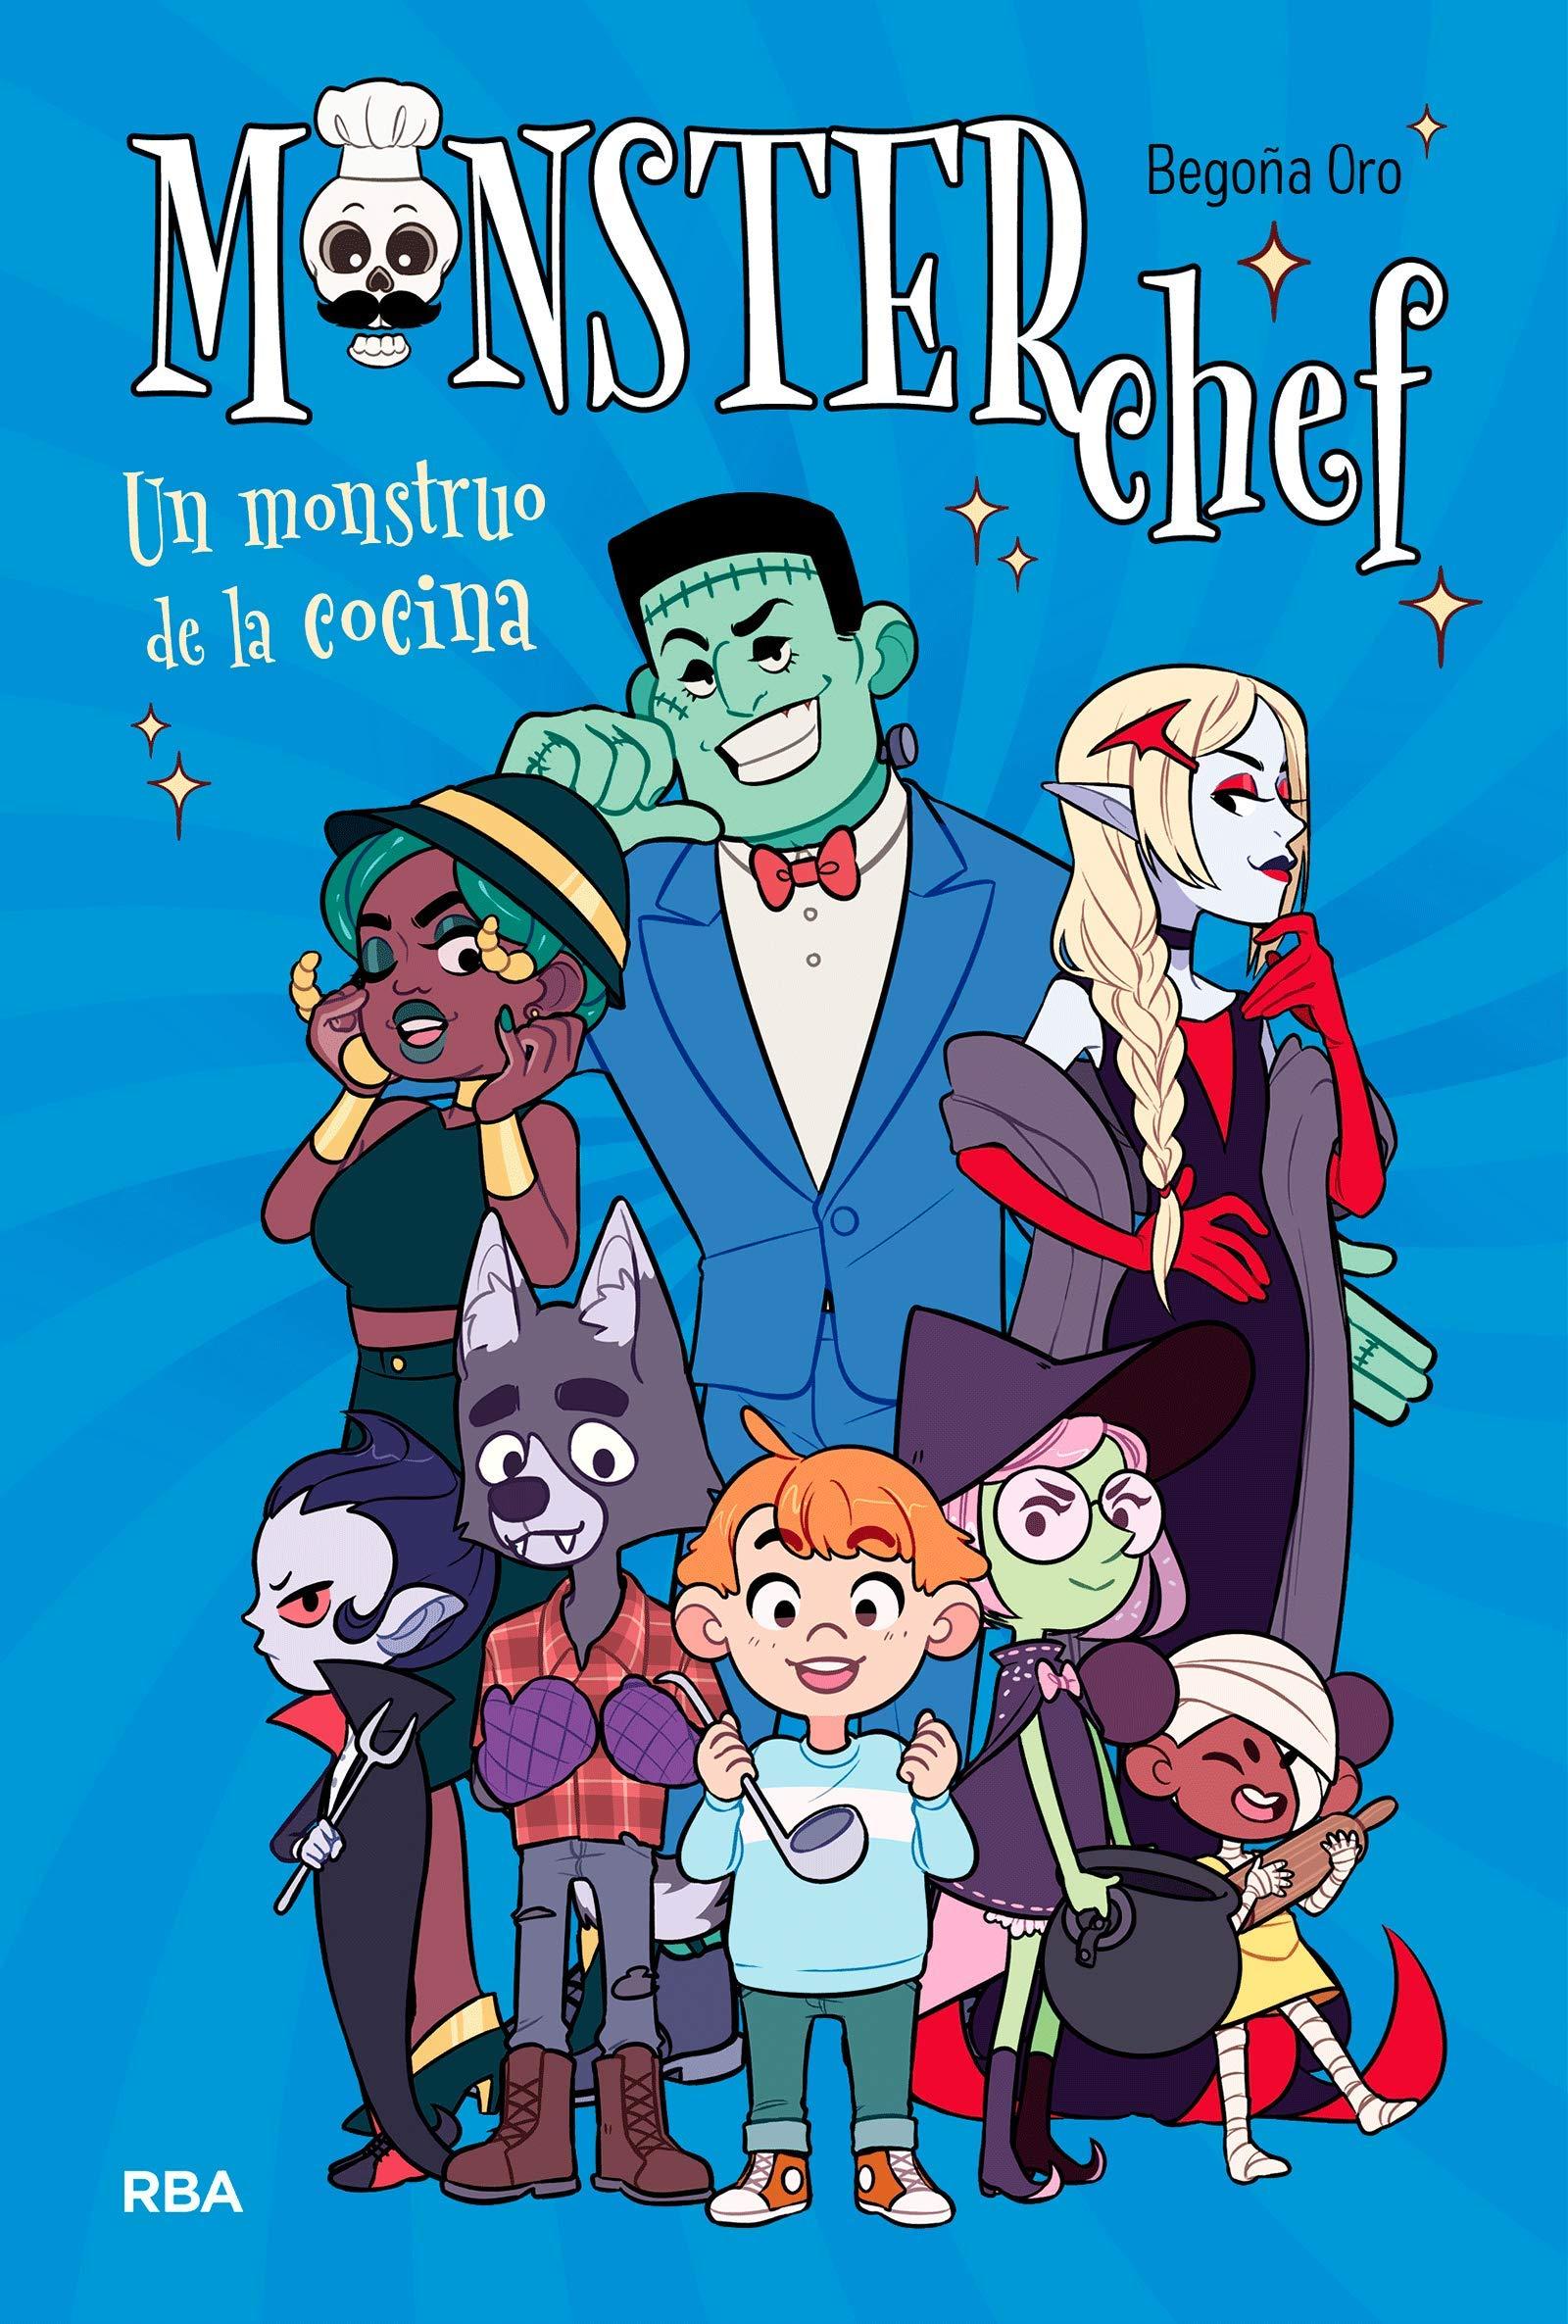 Monsterchef (FICCIÓN KIDS): Amazon.es: Begoña Oro, Tetra: Libros